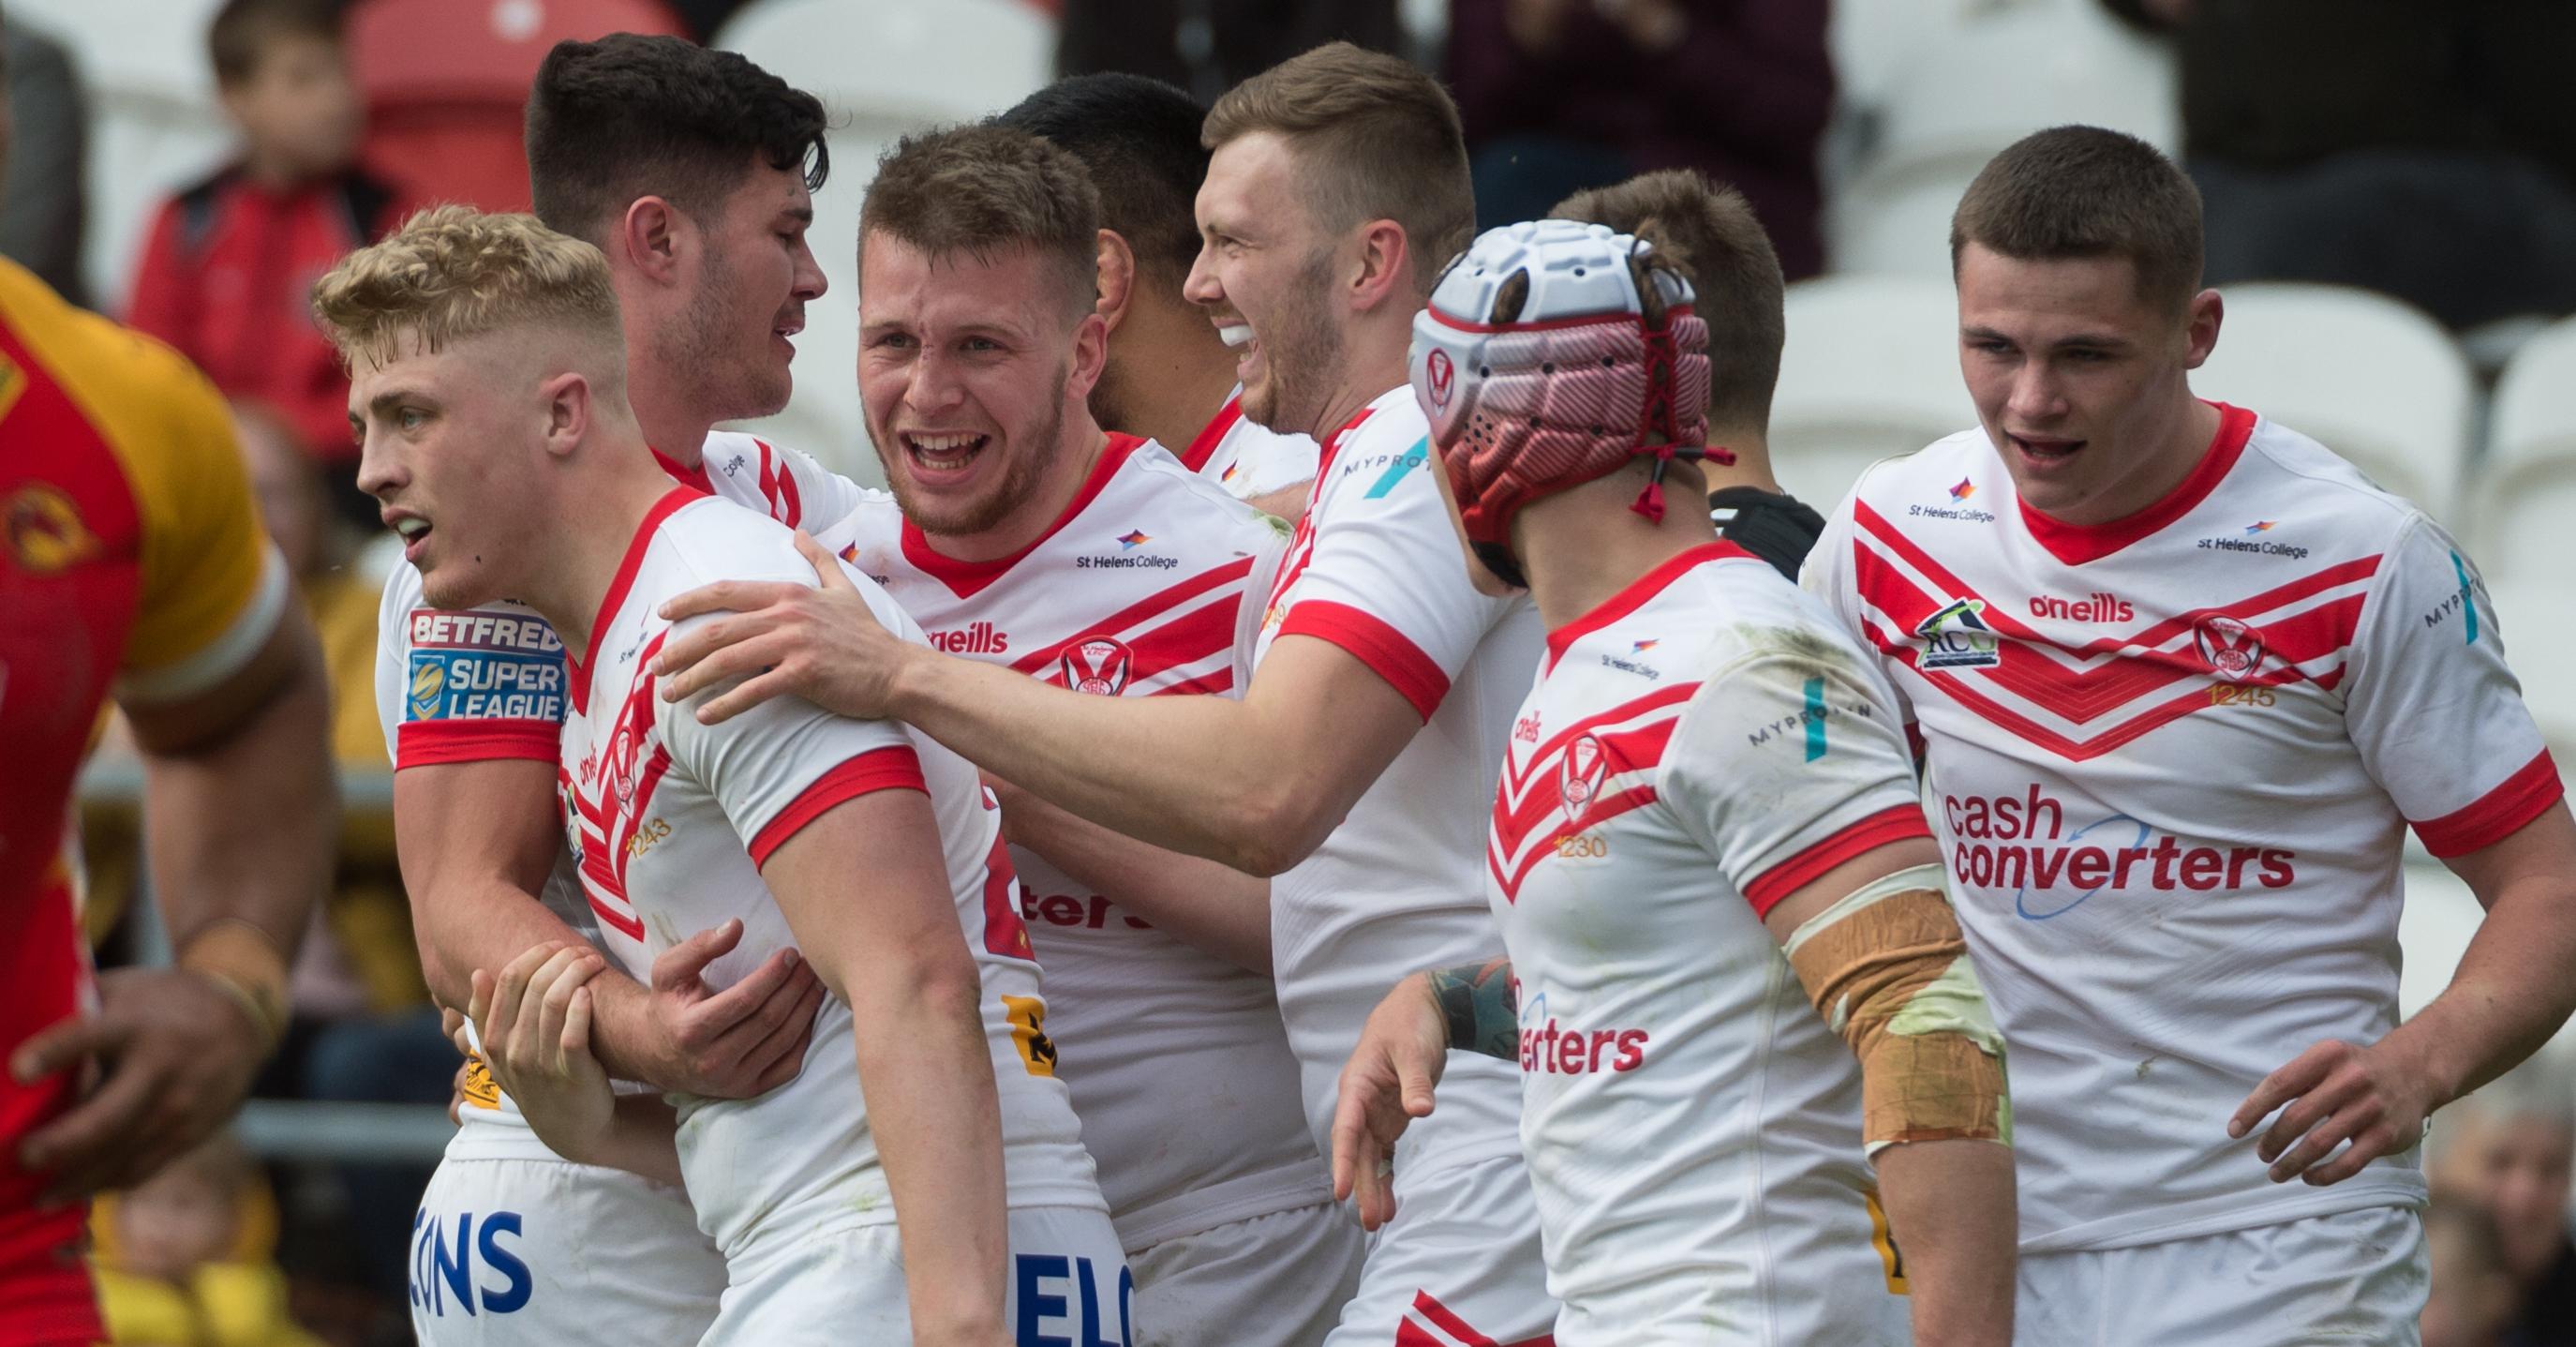 #Awaydays O'Neills Rugby League Partners All Away